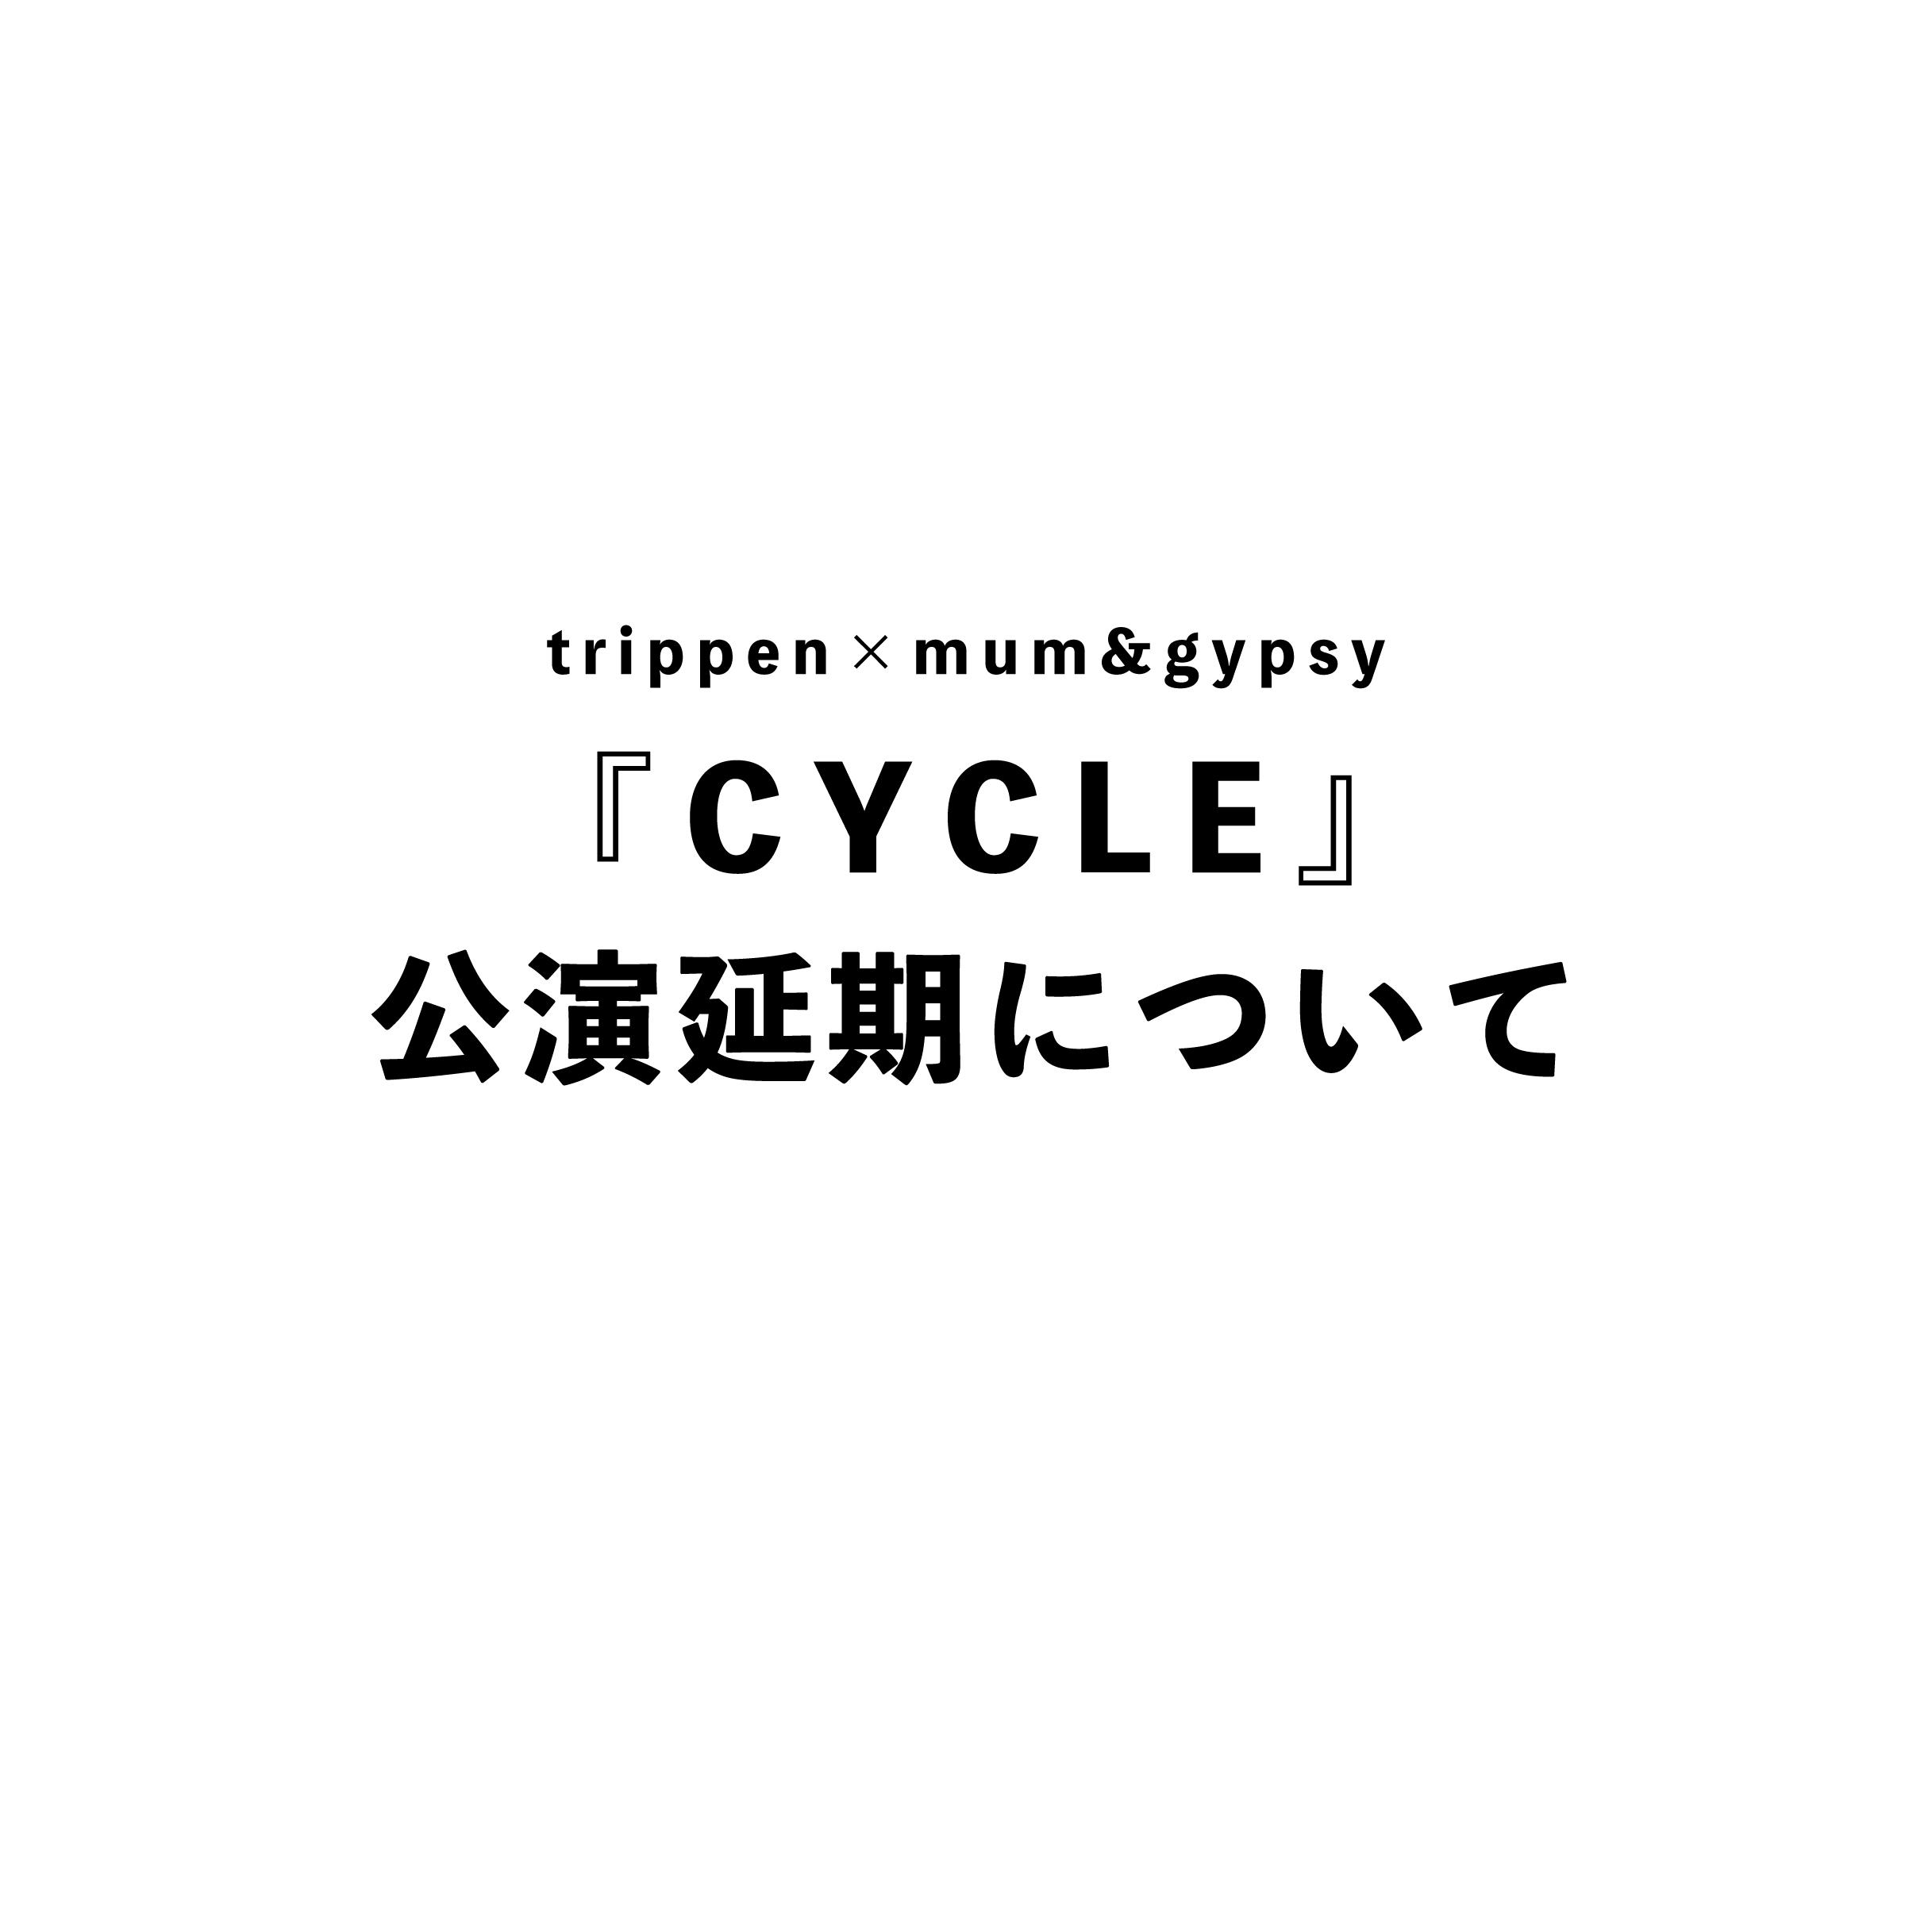 trippen ×mum & gypsy CYCLE 公演延期のお知らせ